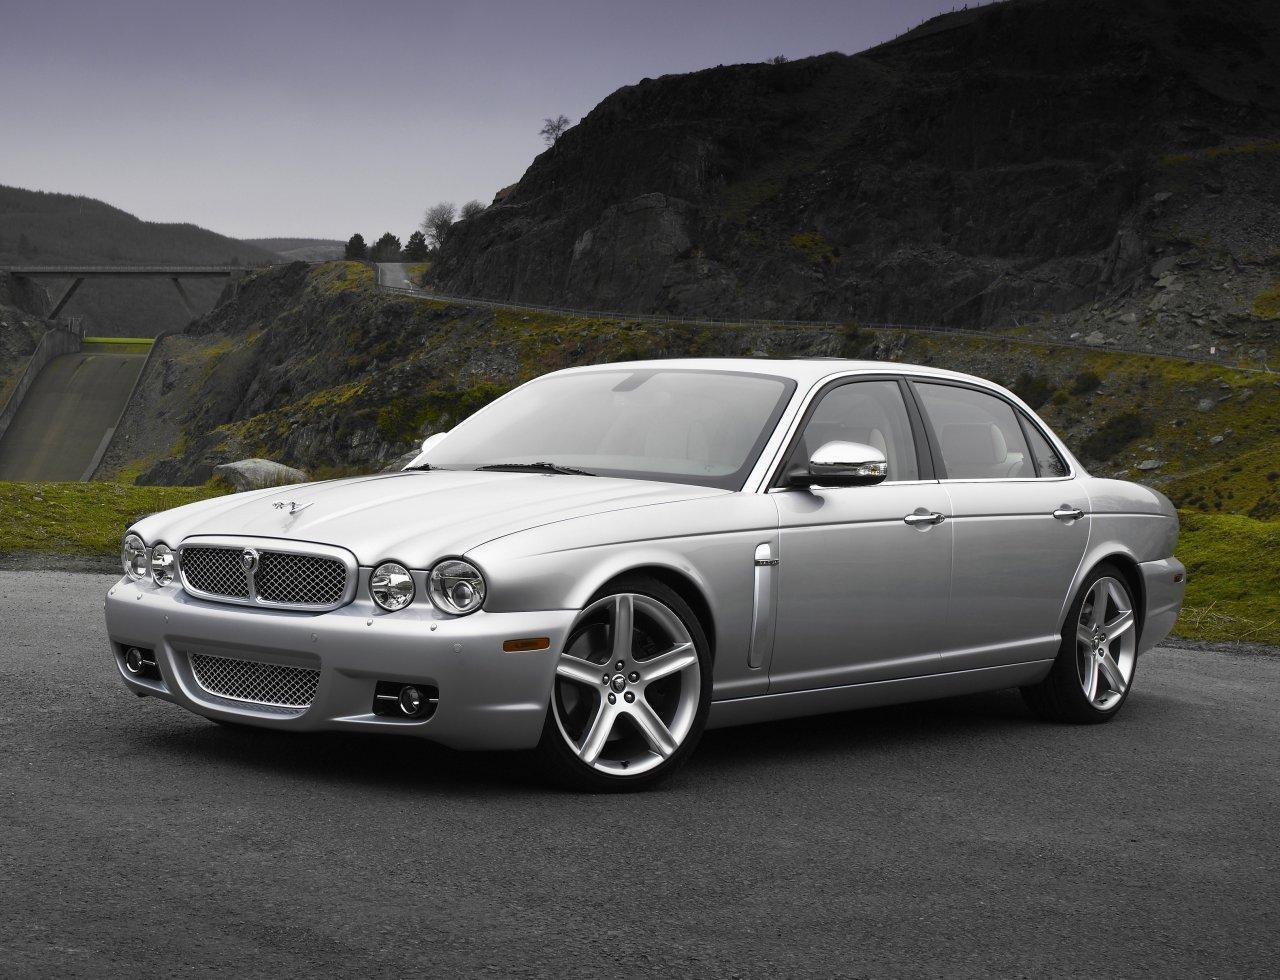 jags 7 jaguar cars 12430456 1280 980